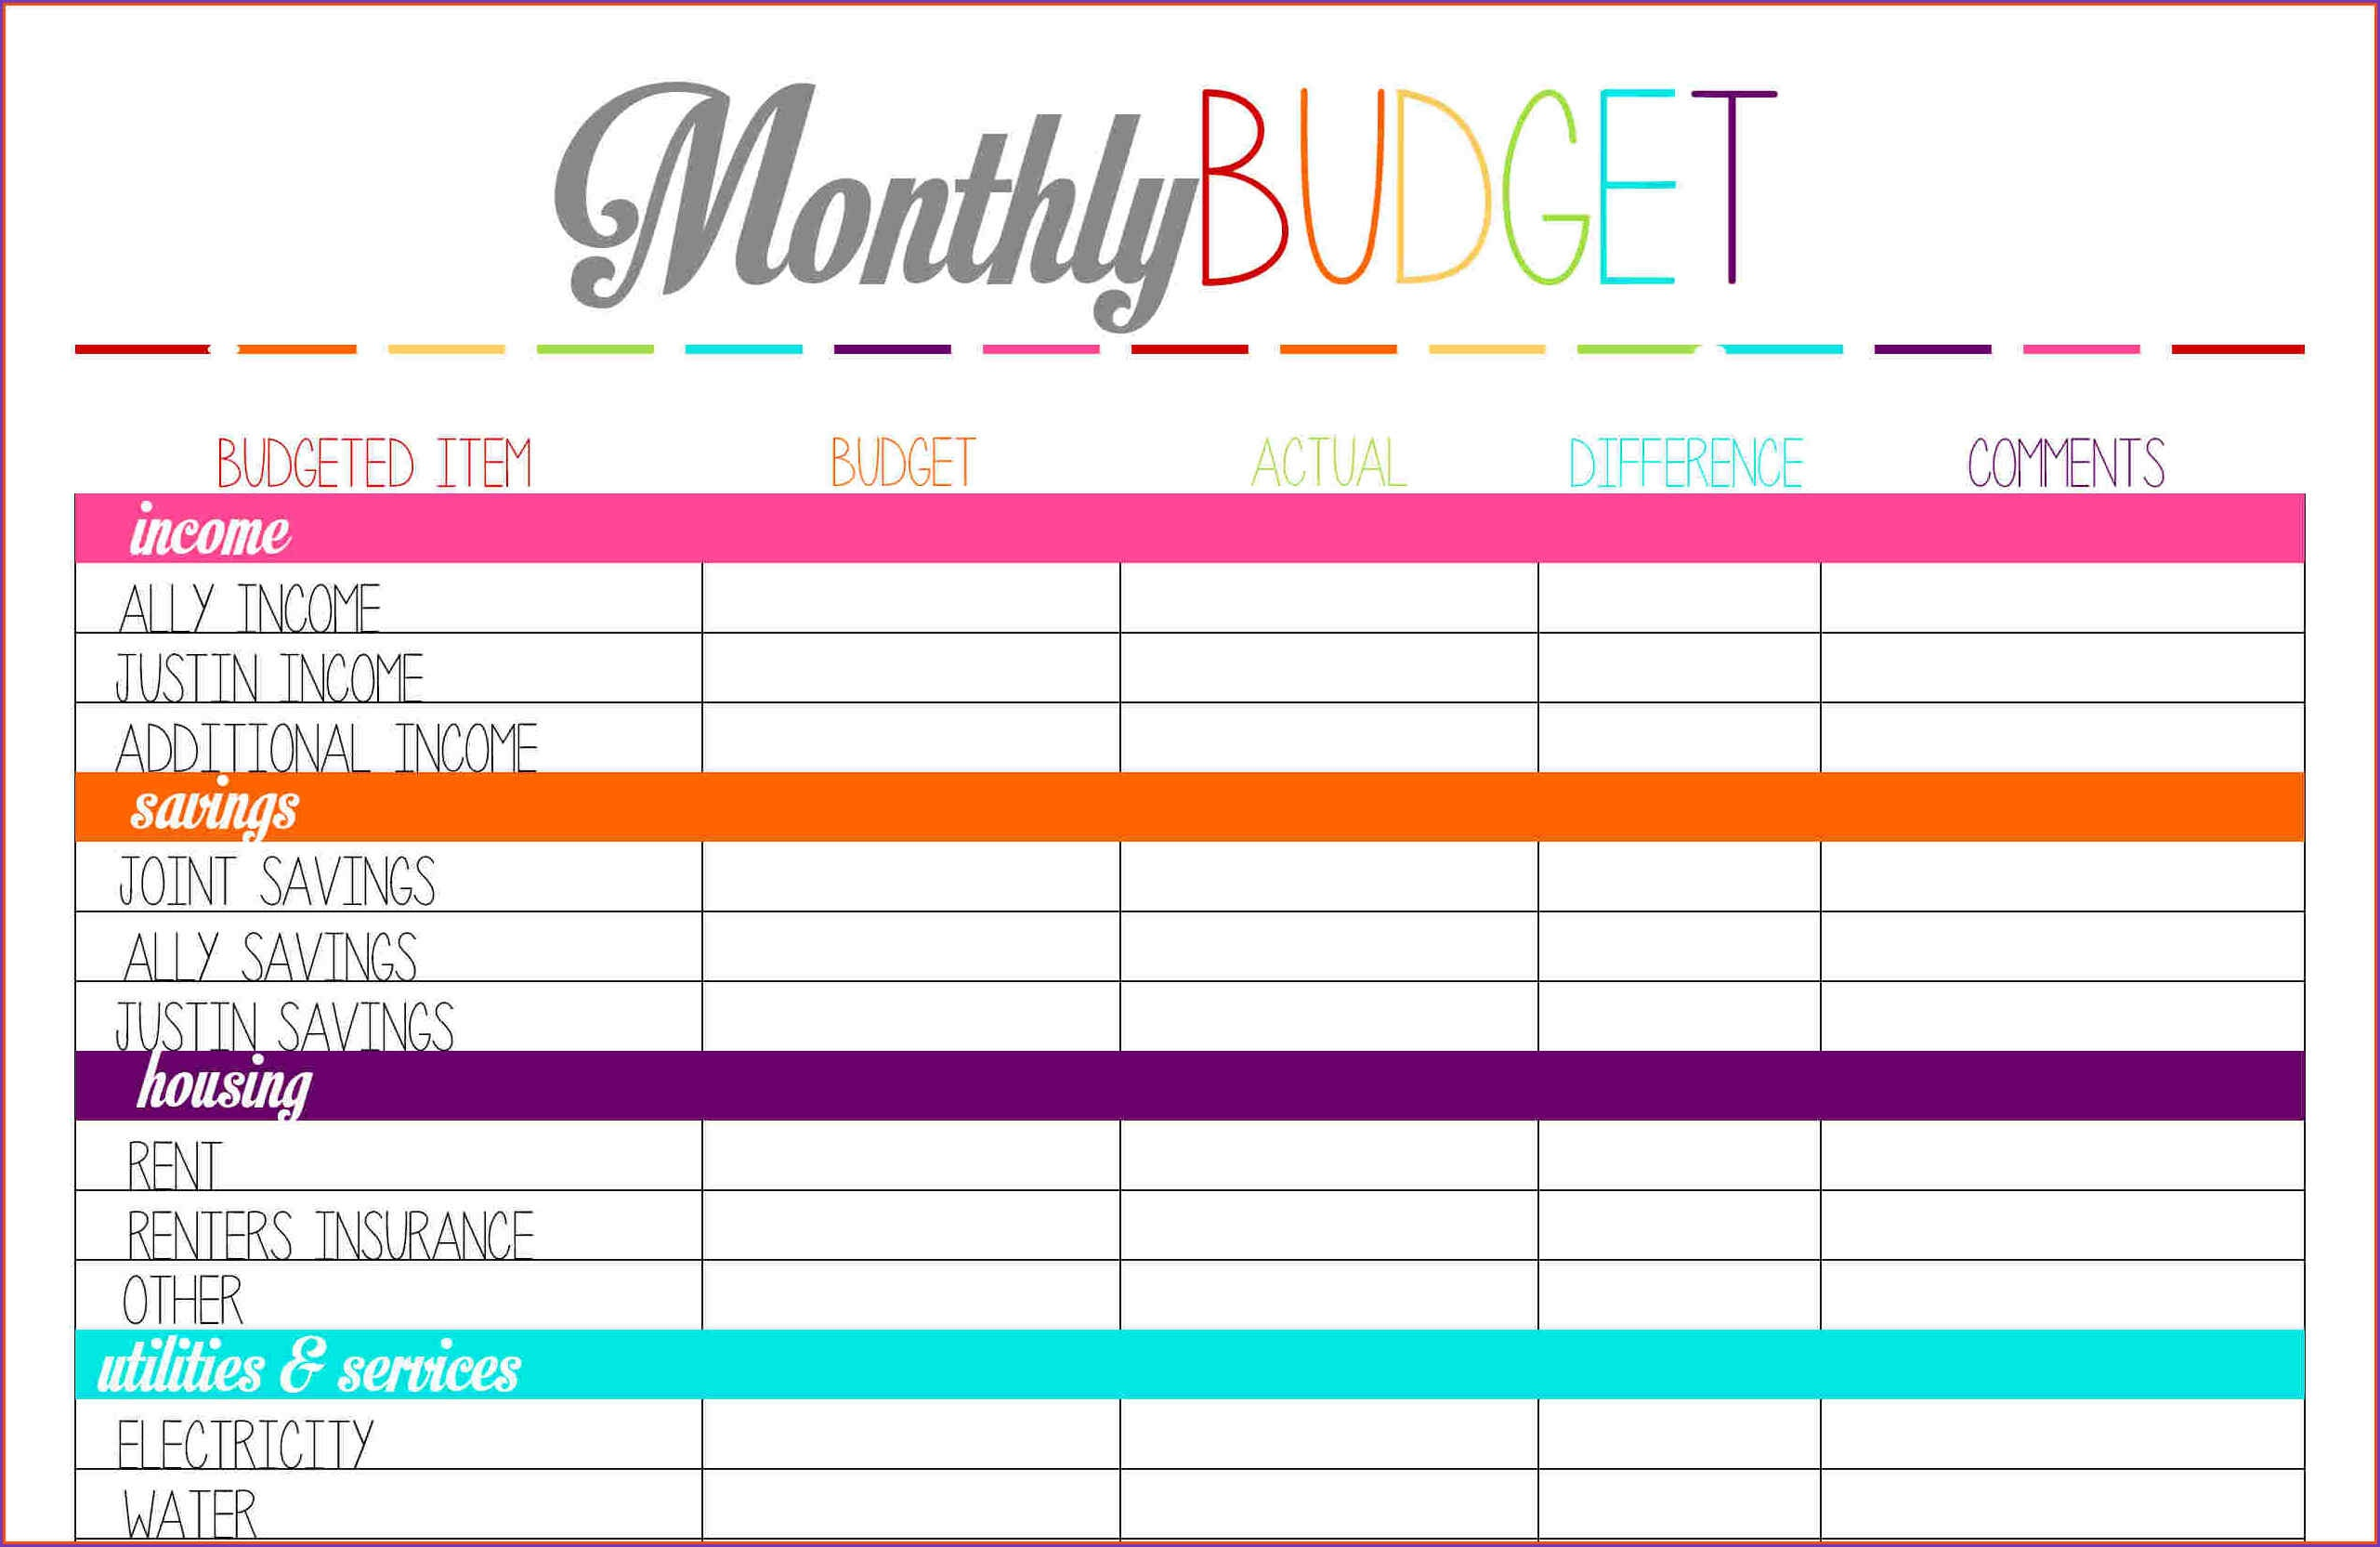 Template Ideas Freeget Planner Worksheet Monthly Bills Printable - Free Printable Monthly Budget Worksheets